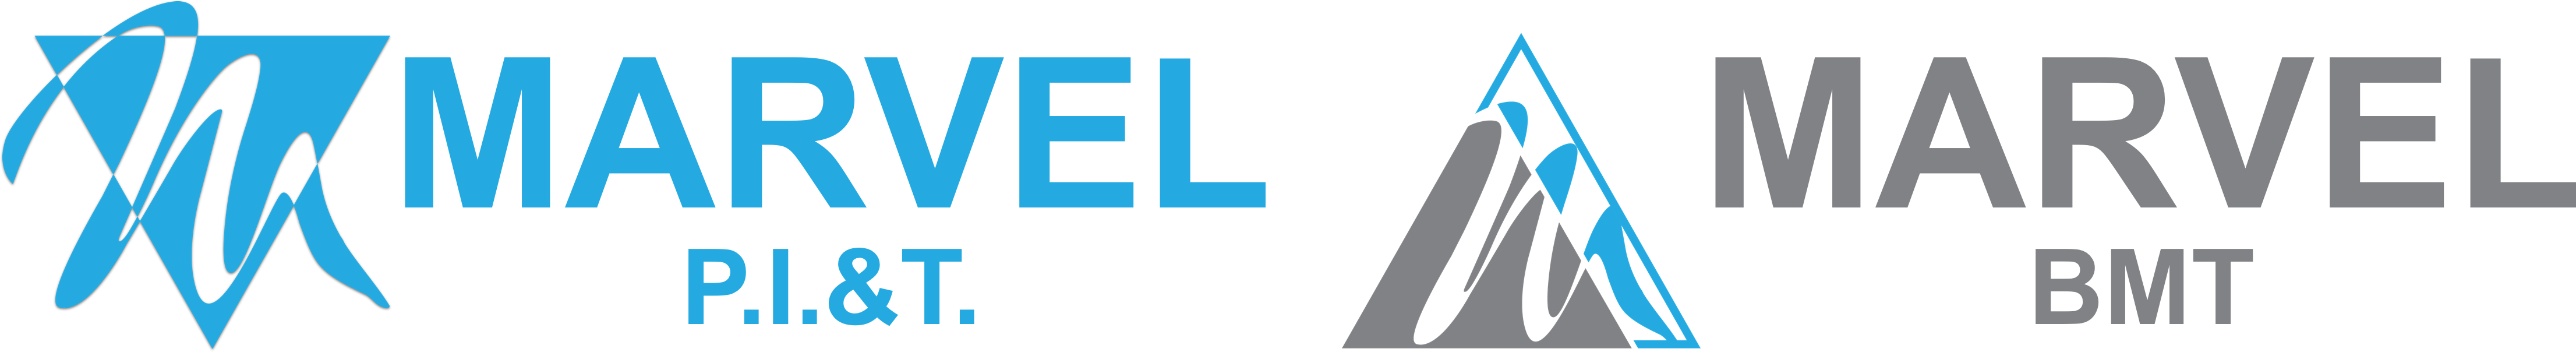 MARVEL P.I.&T. | MARVEL-BMT | Electric actuators